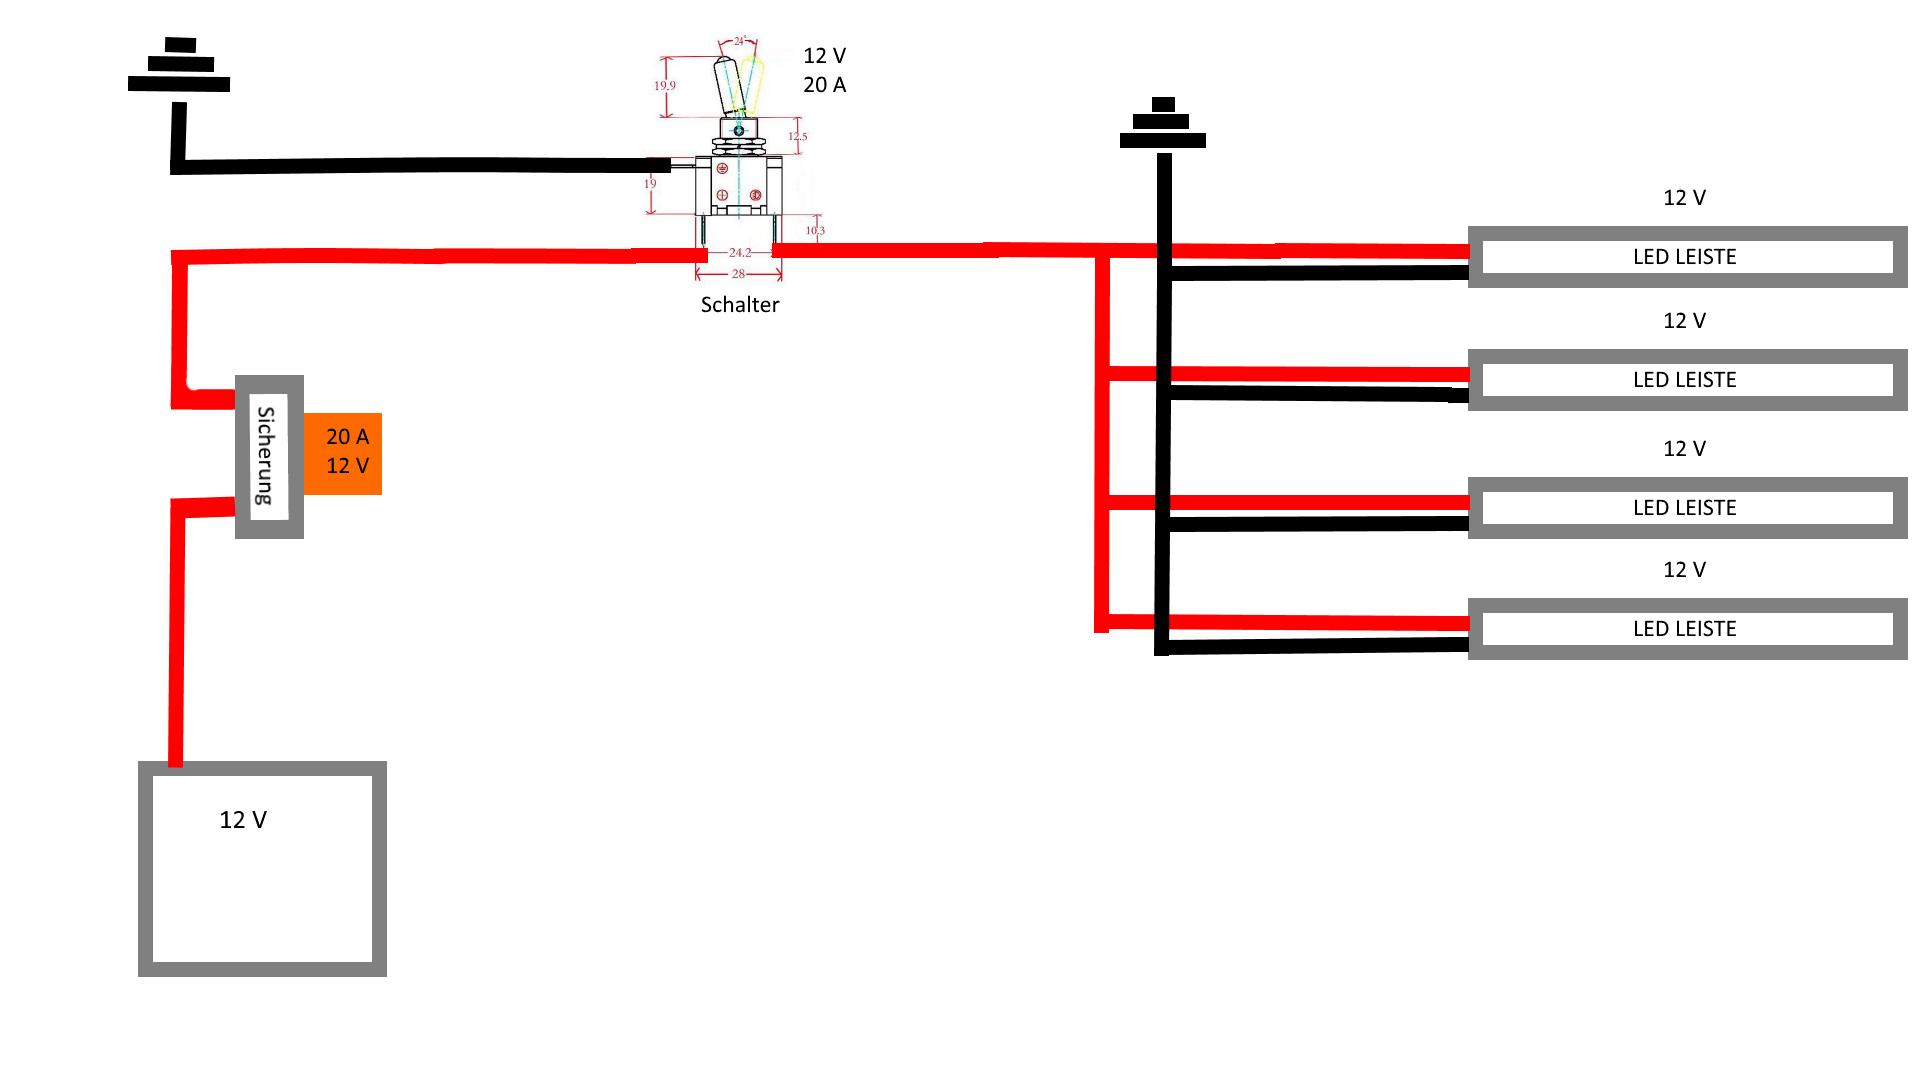 Eigenbau - Richtige LED Installation im KFZ? (Auto, Elektronik ...